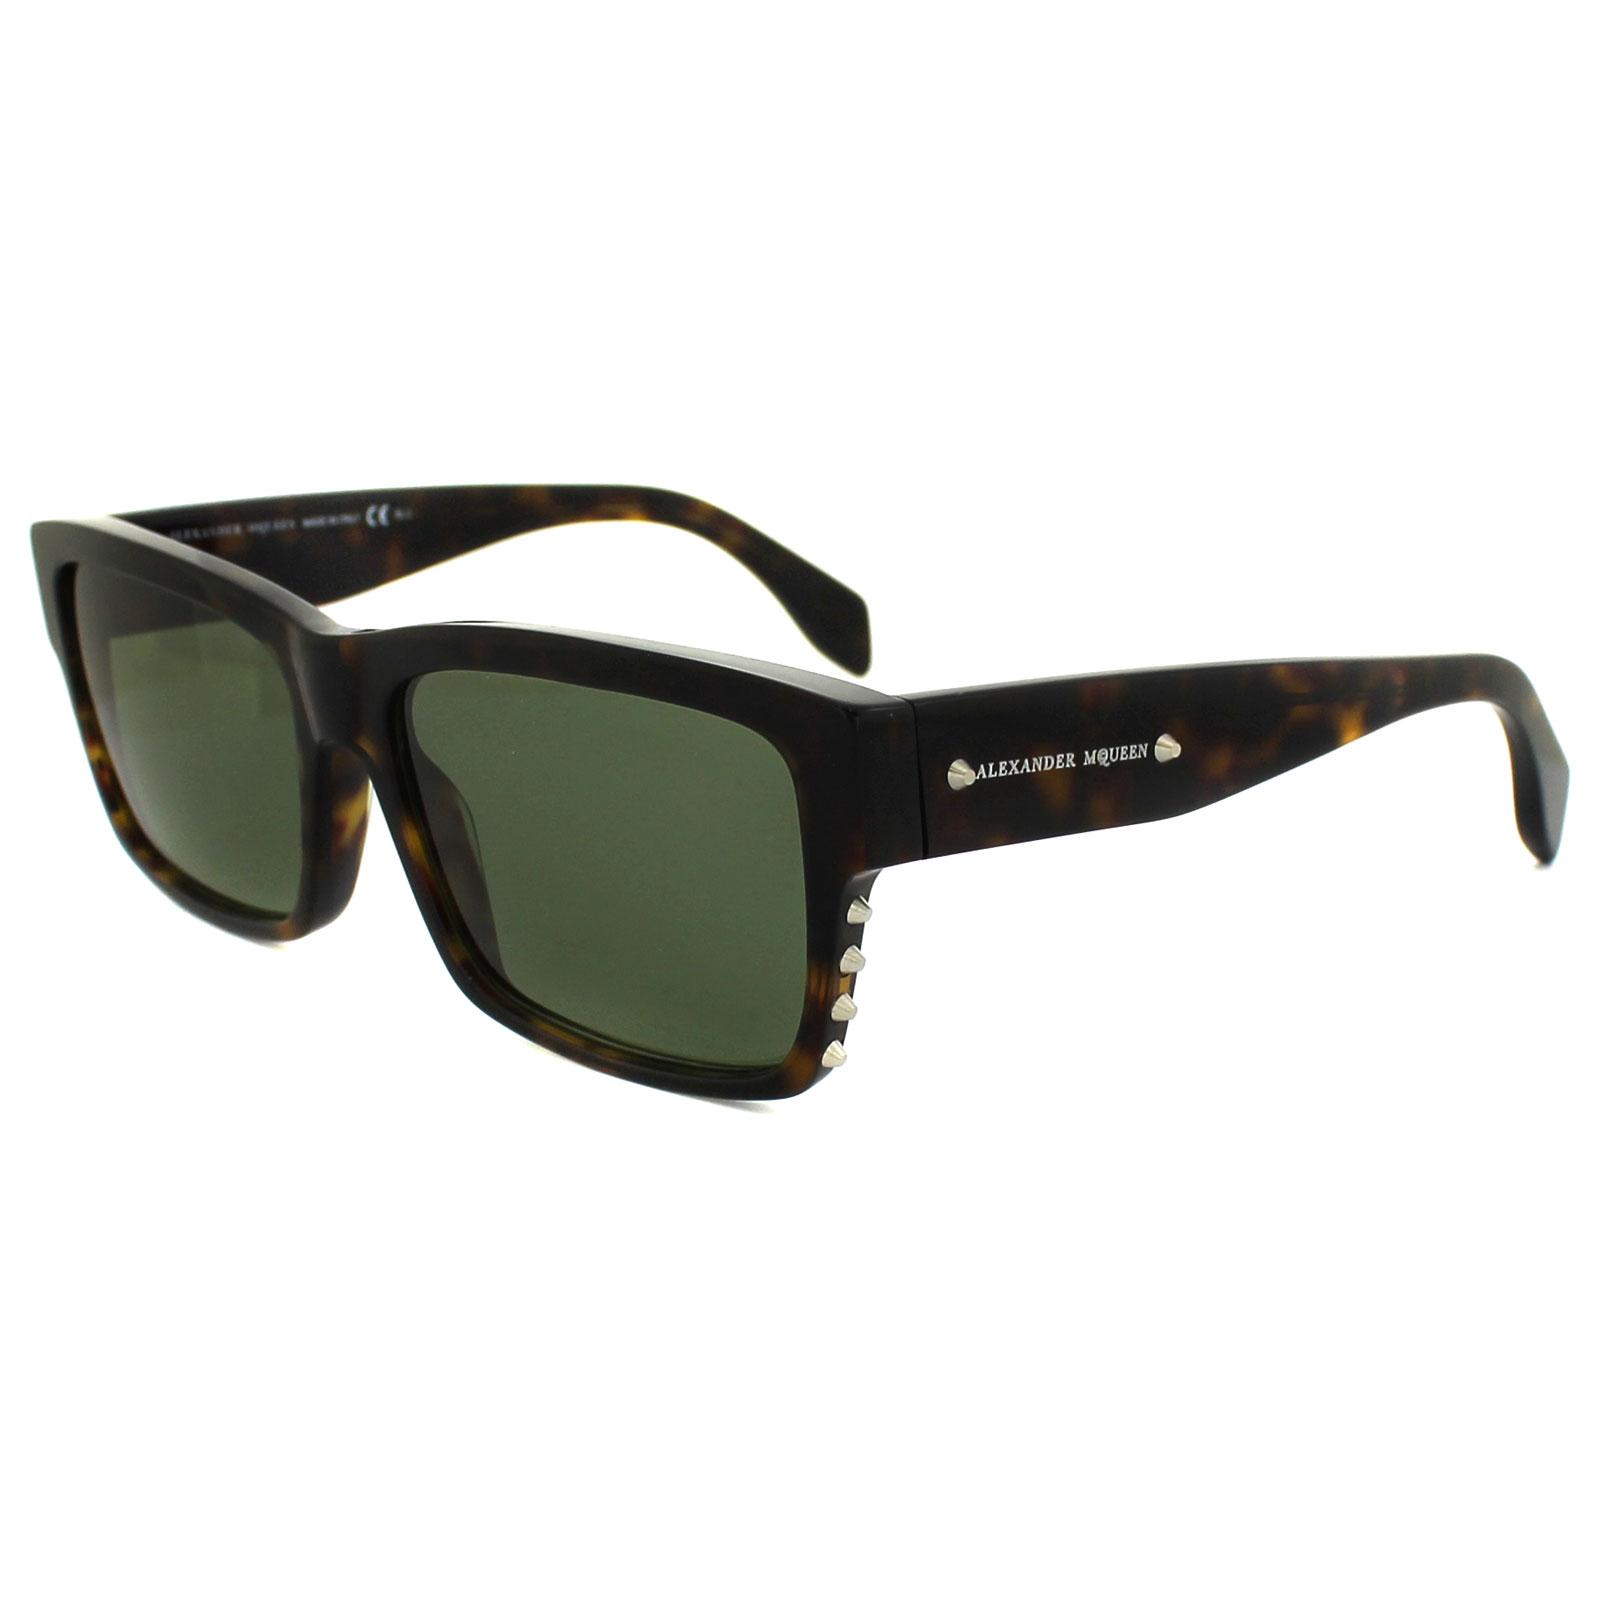 Alexander Sunglasses  alexander mcqueen sunglasses 4258 s 086 dj dark havana green ebay